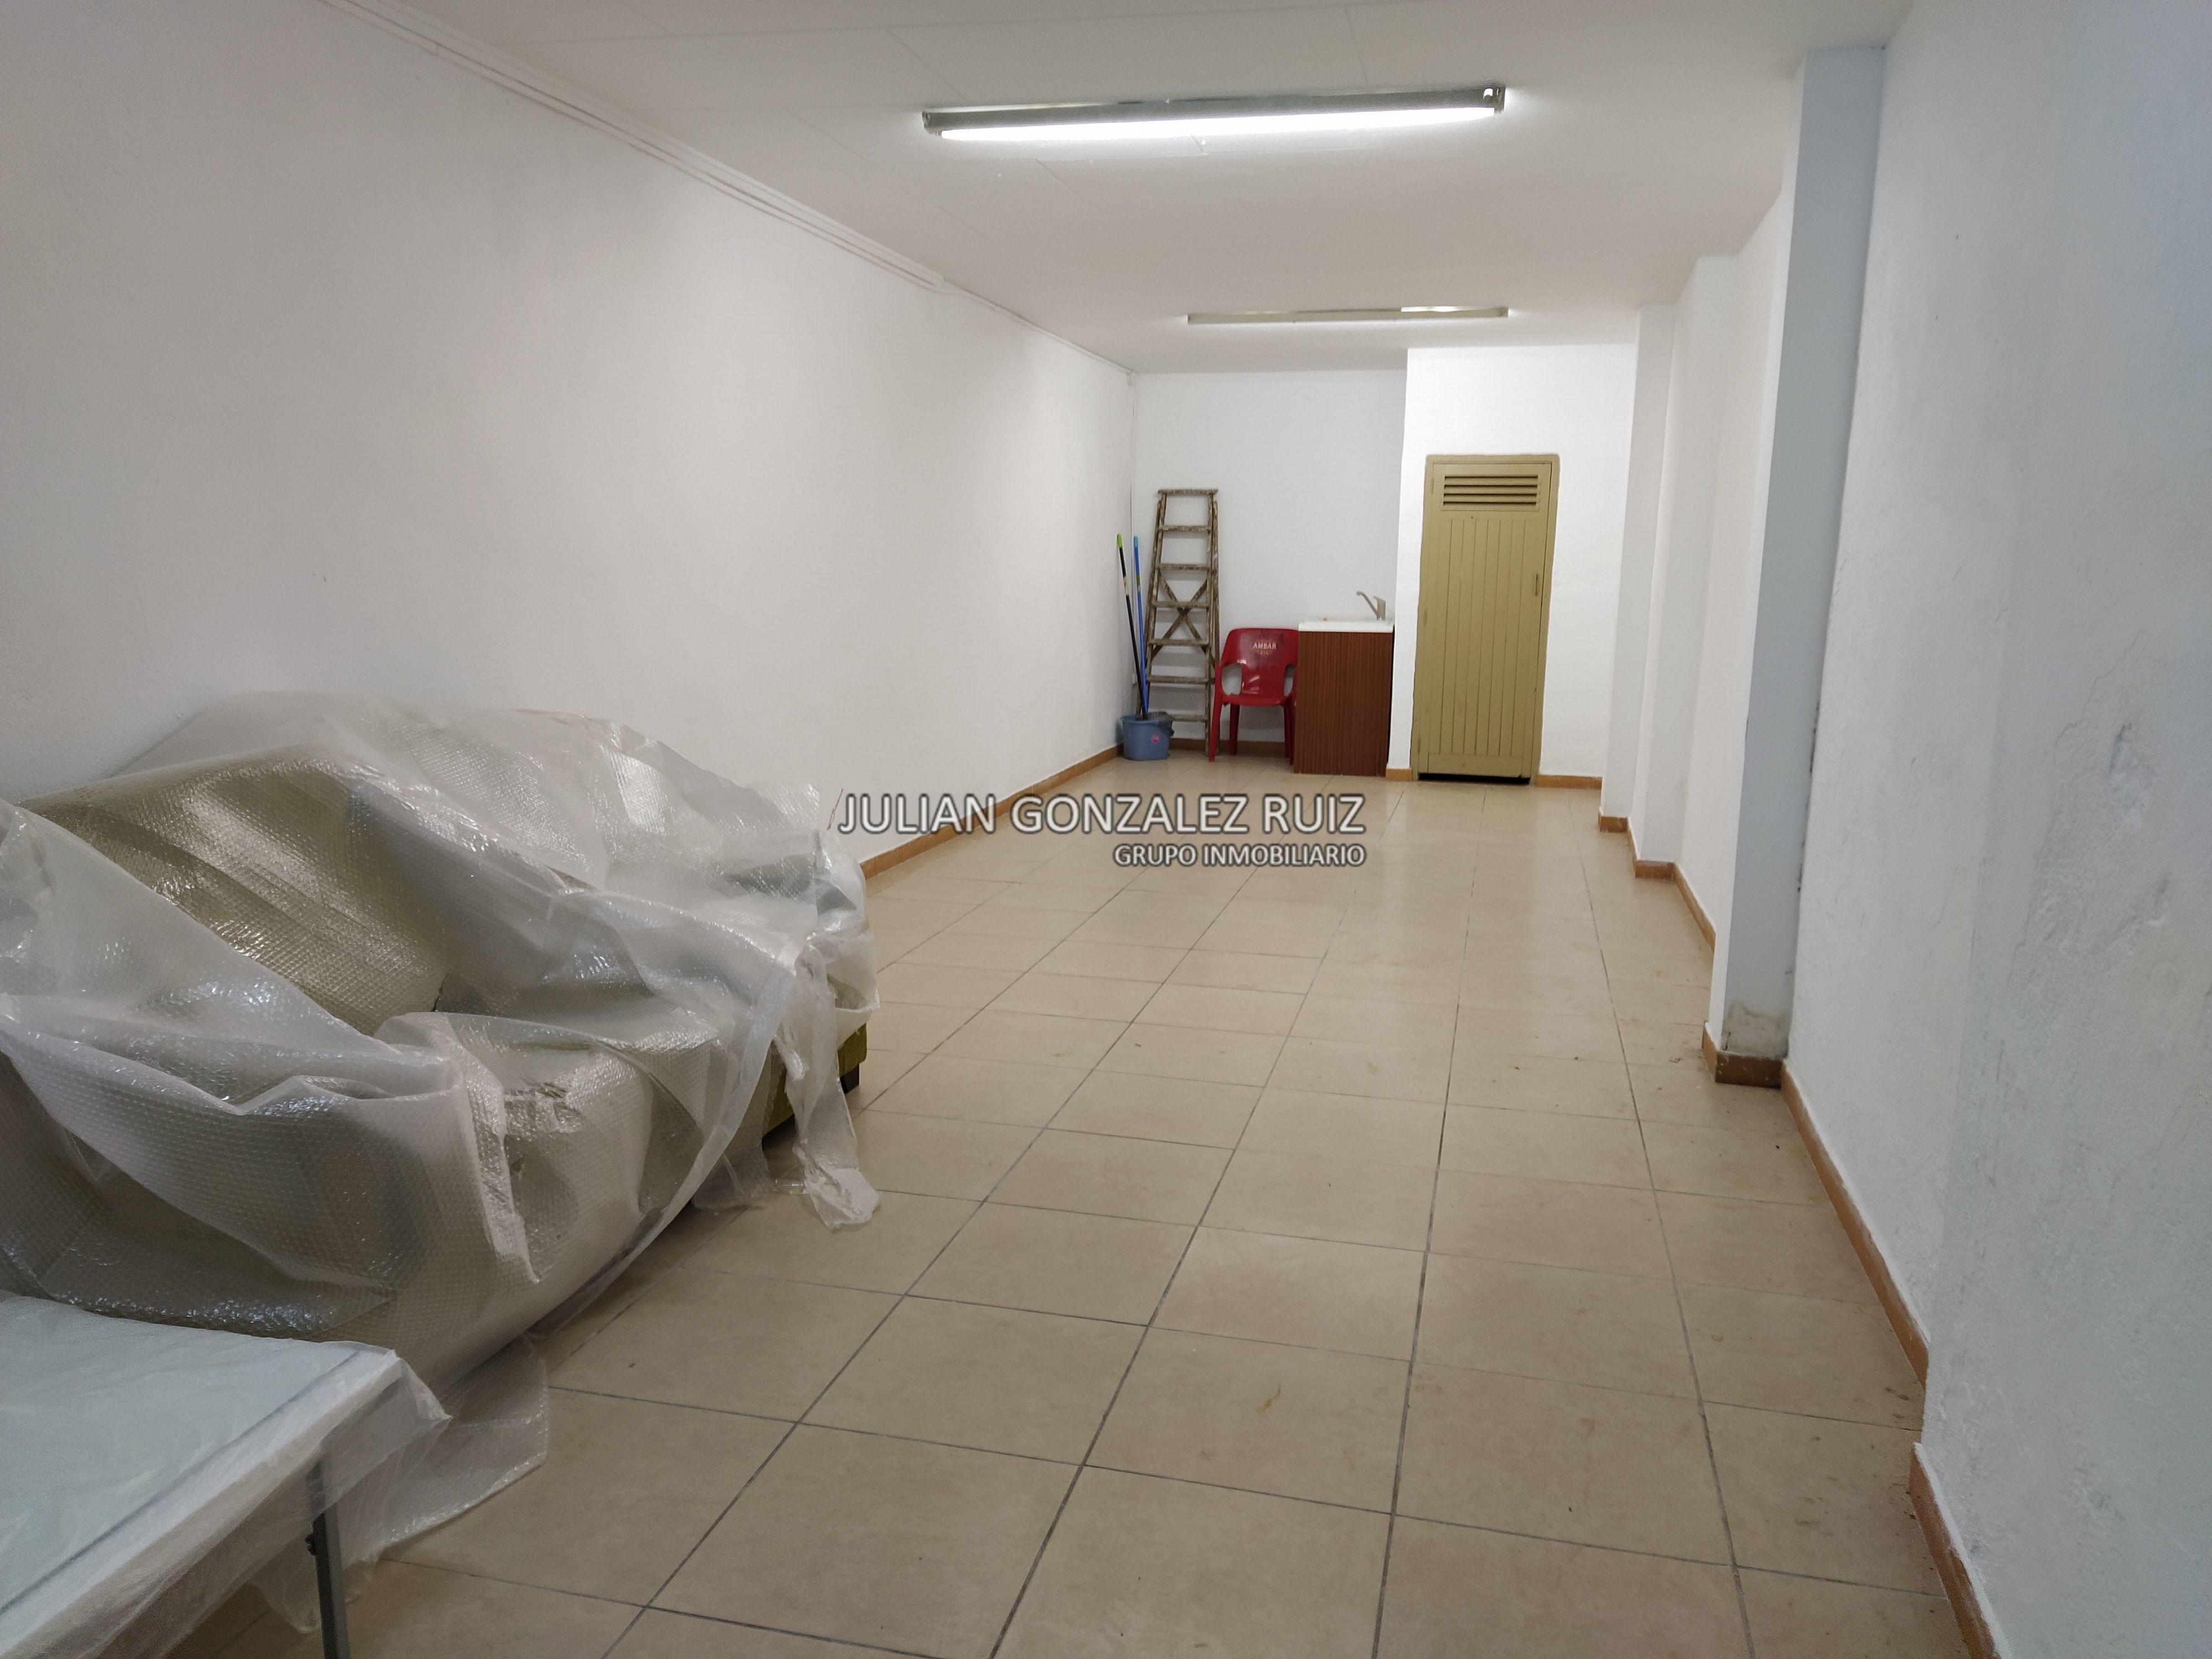 Local Comercial en alquiler de 70 m2 en Castellón